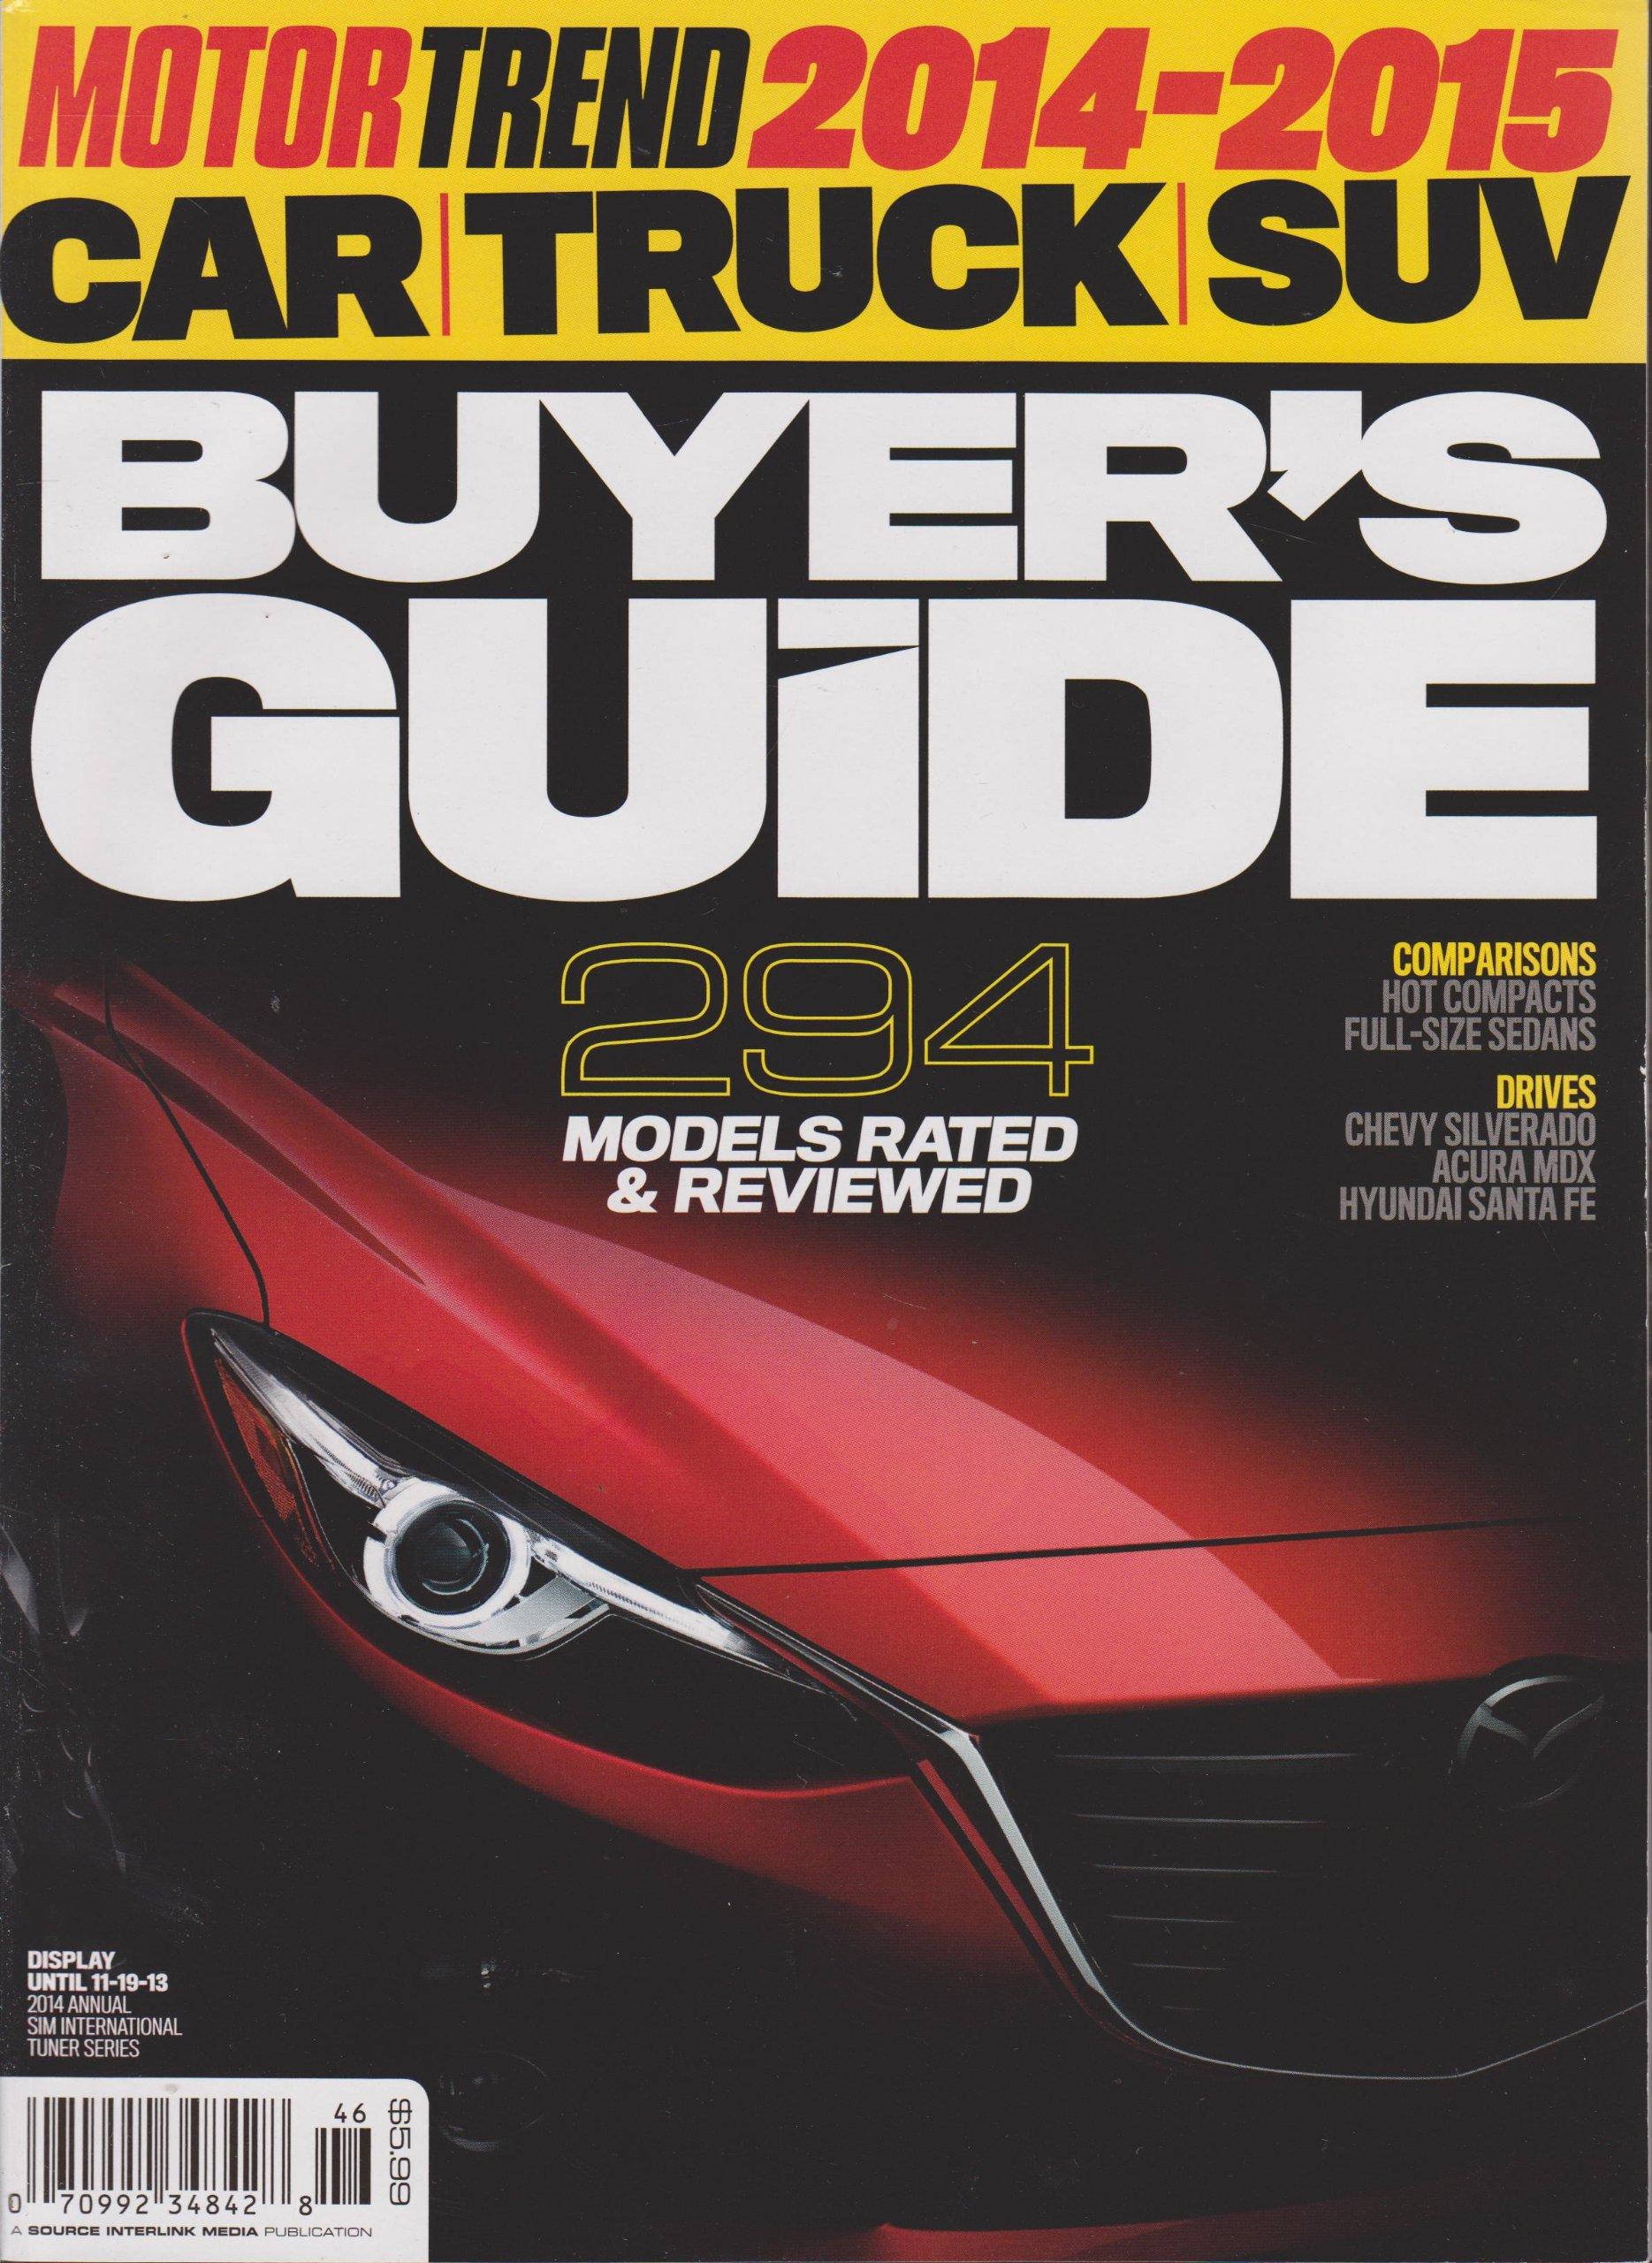 Motor Trend 2014 2015 Car Truck Suv Buyer S Guide Magazine Cover 2 Amazon Com Books